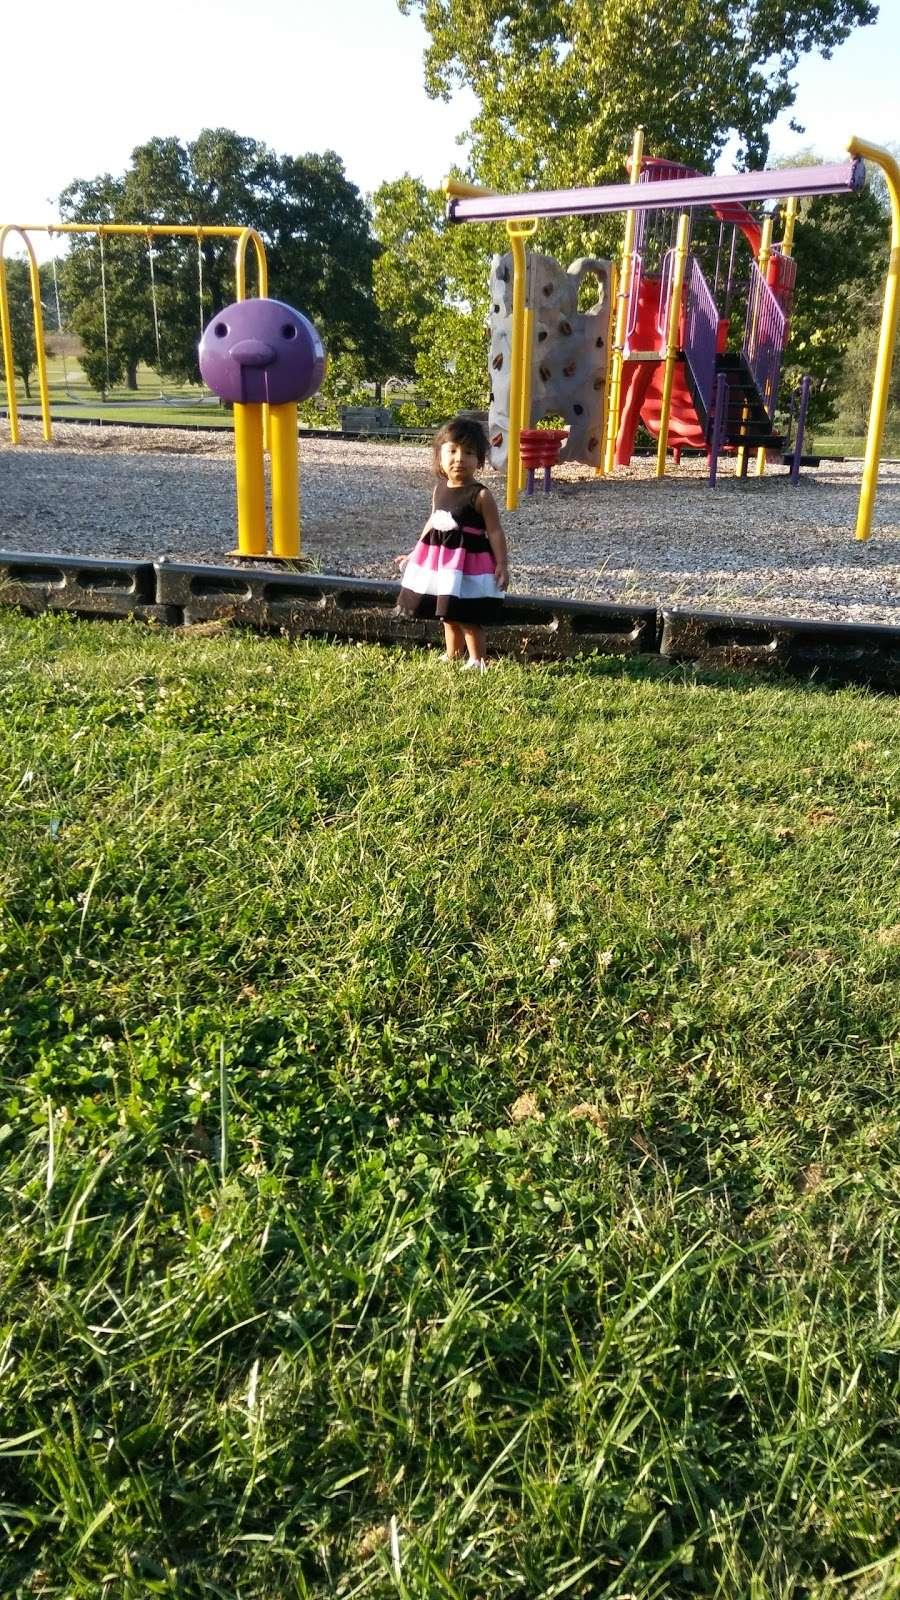 Heathwood Park - park  | Photo 3 of 10 | Address: 1021 Parallel Pkwy, Kansas City, KS 66104, USA | Phone: (913) 573-5000